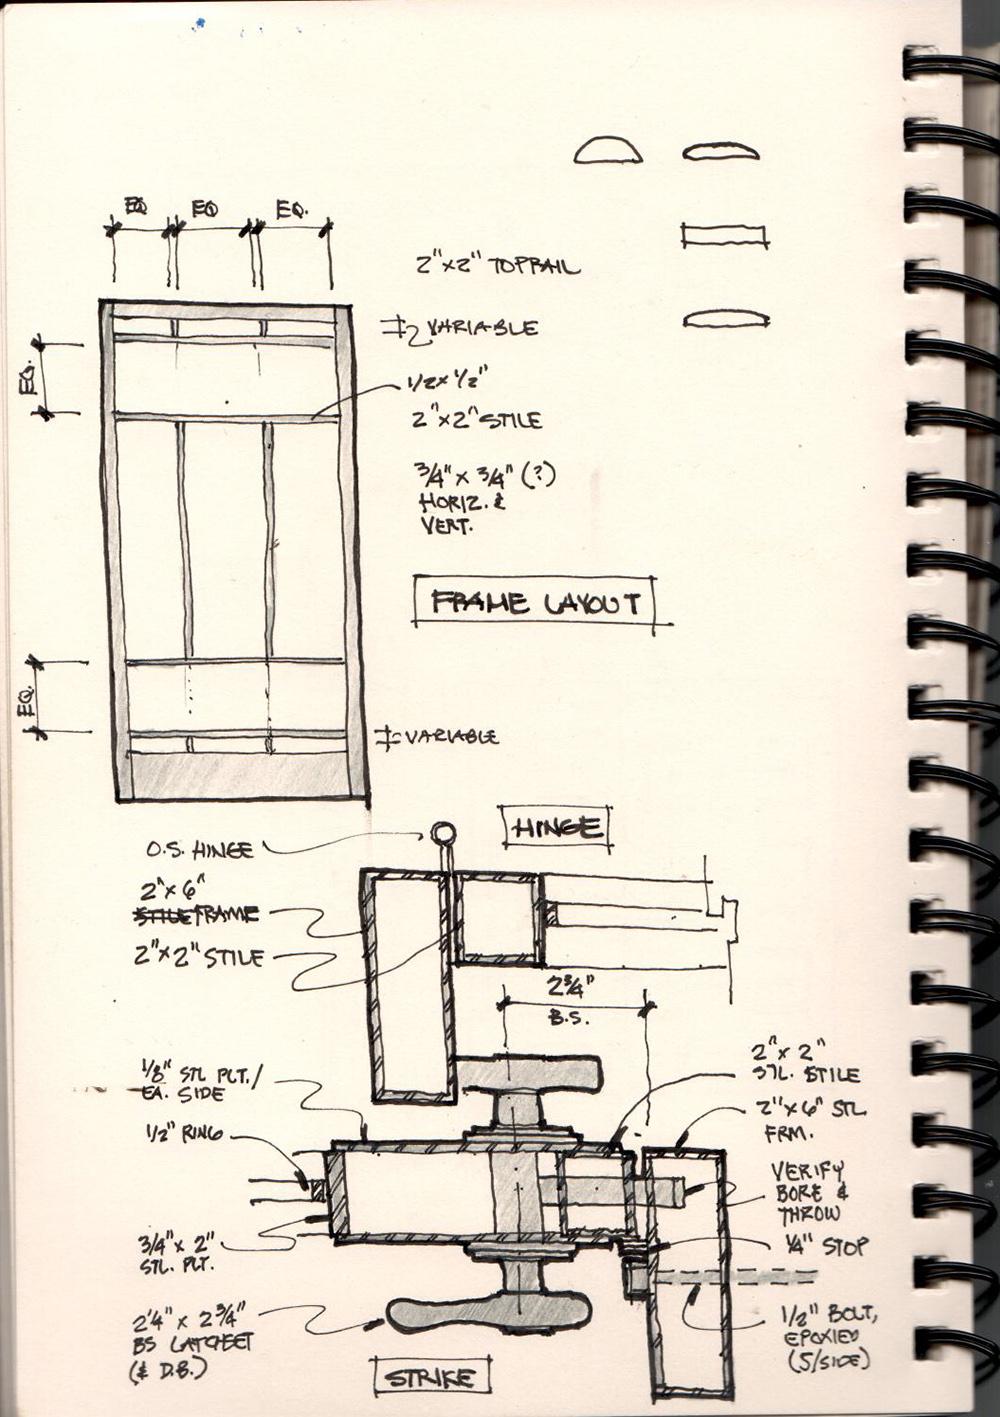 georgearchitecture_studio_mmw-gate_sketch06.jpg